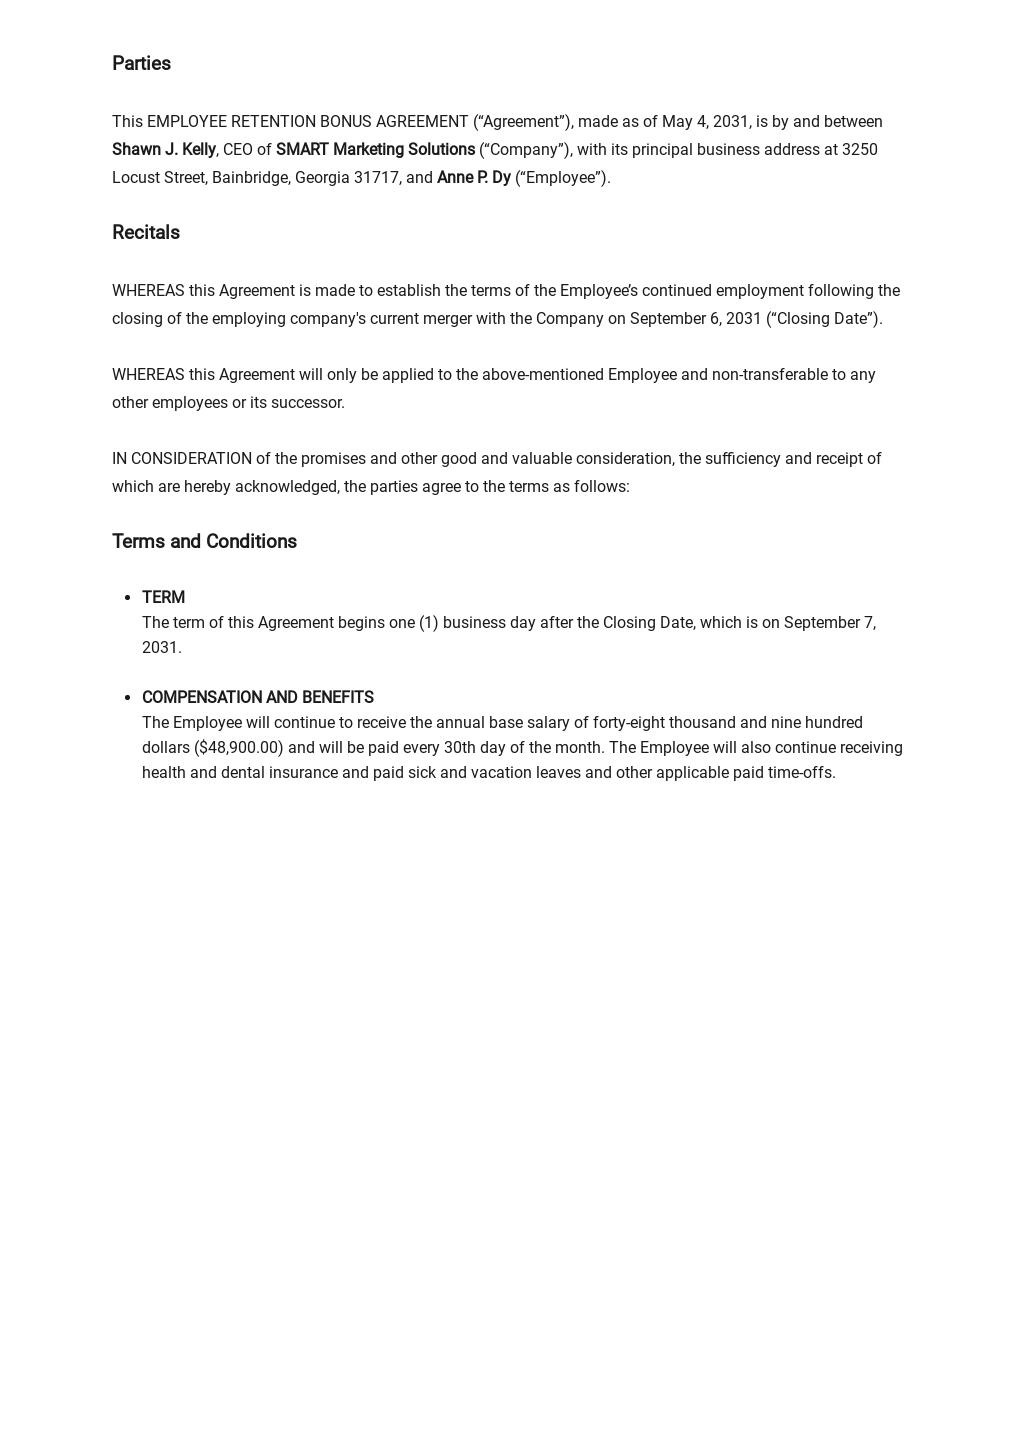 Employee Retention Bonus Agreement Template 1.jpe